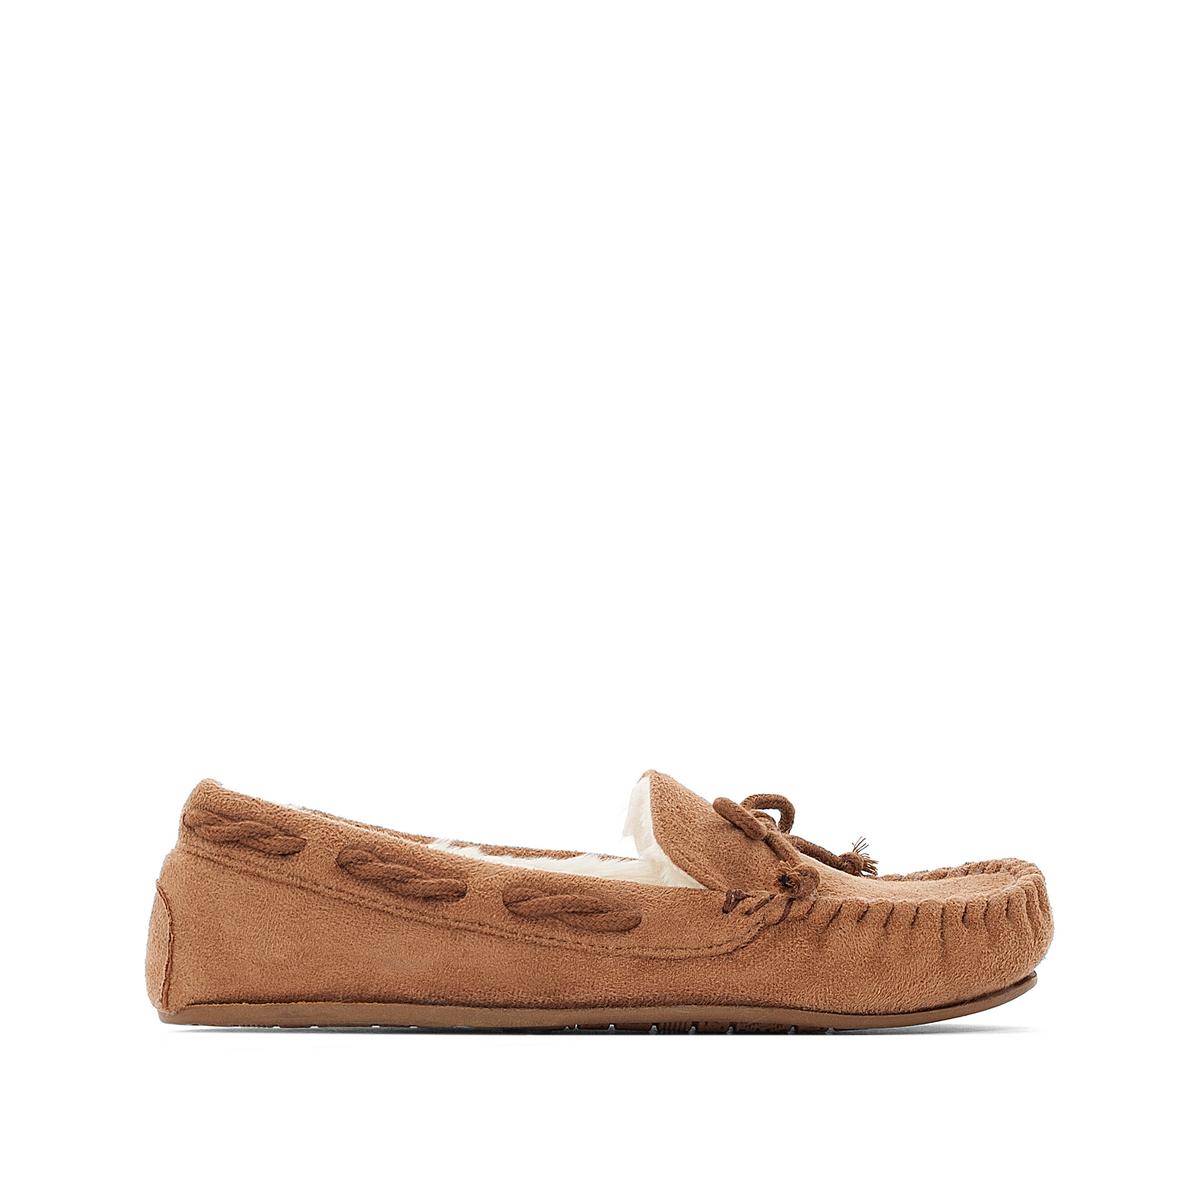 Schuhe » Damen-Hausschuhe online kaufen | Damenmode-Suchmaschine ...